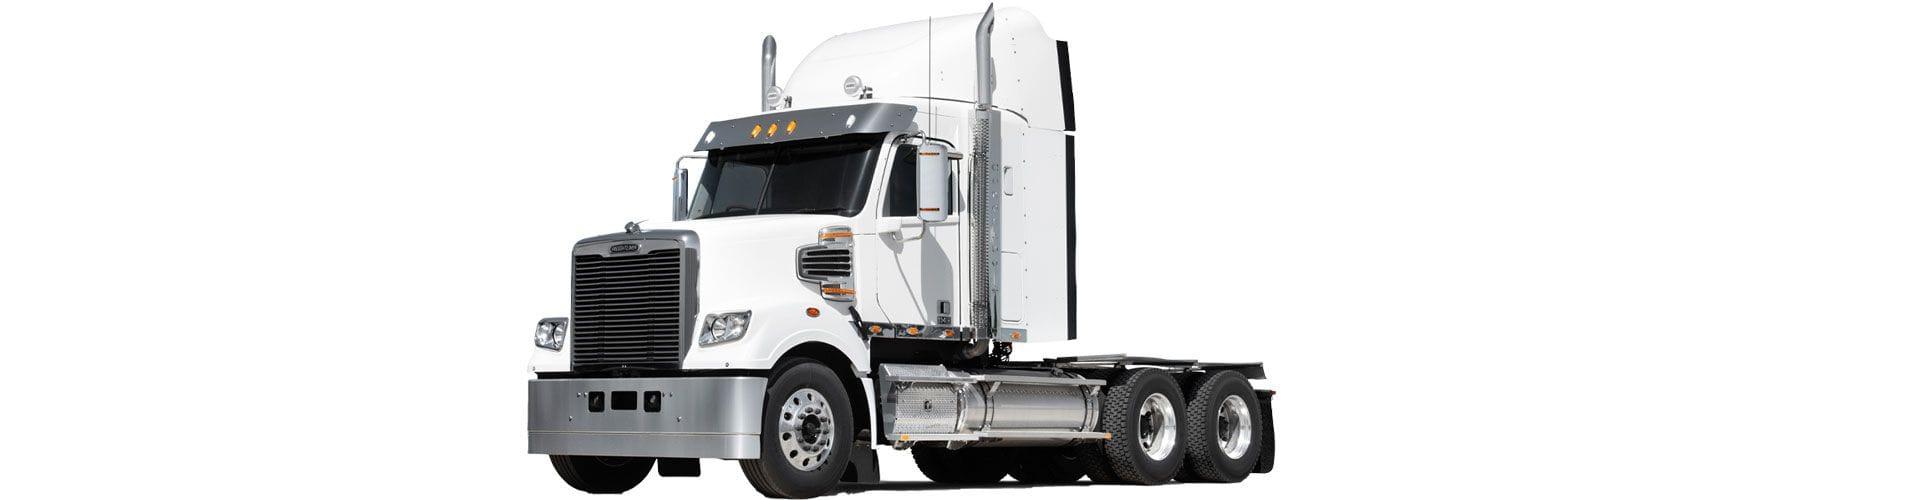 Freightliner Coronado 114 | Daimler Trucks Albury & Wagga